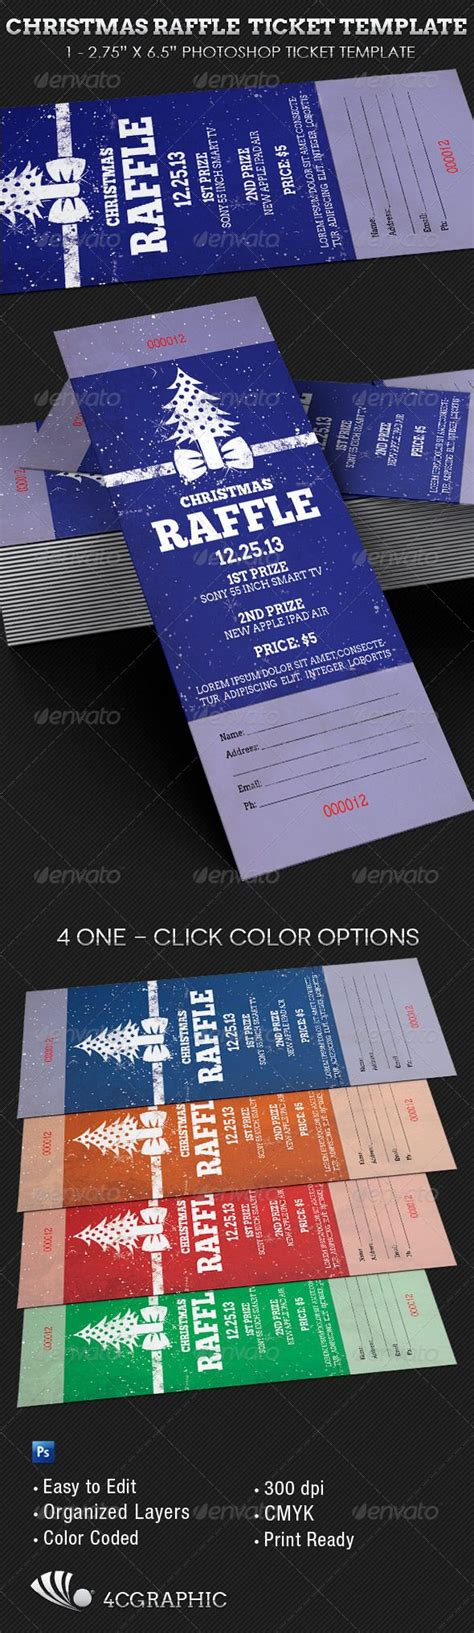 printable christmas raffle tickets best 20 ticket template ideas on pinterest ticket